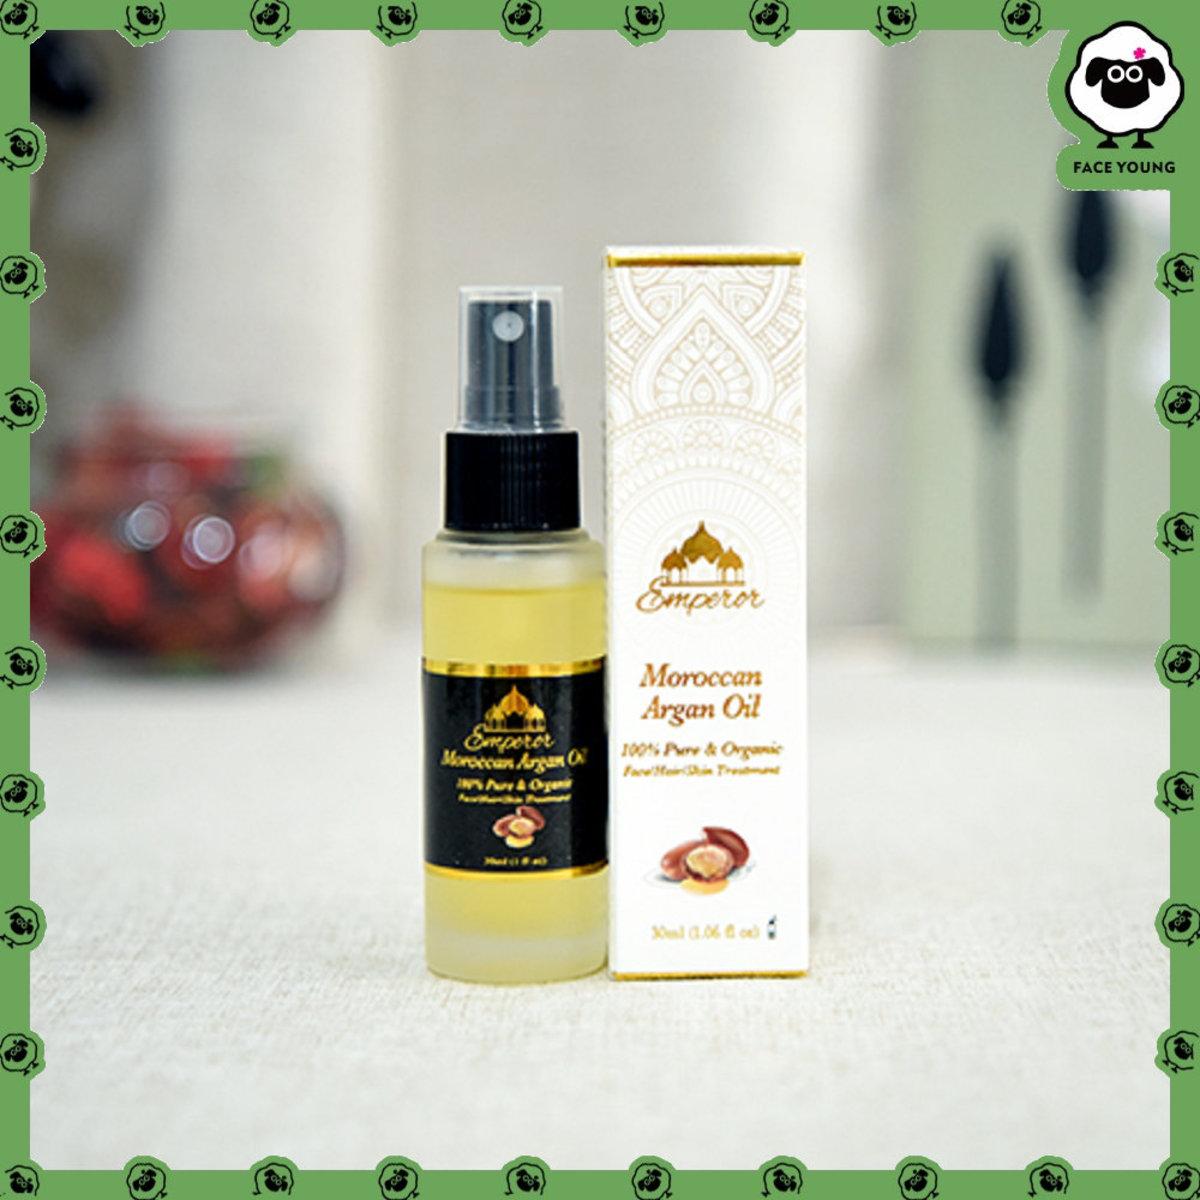 100% Moroccan Argan Oil (30ml)